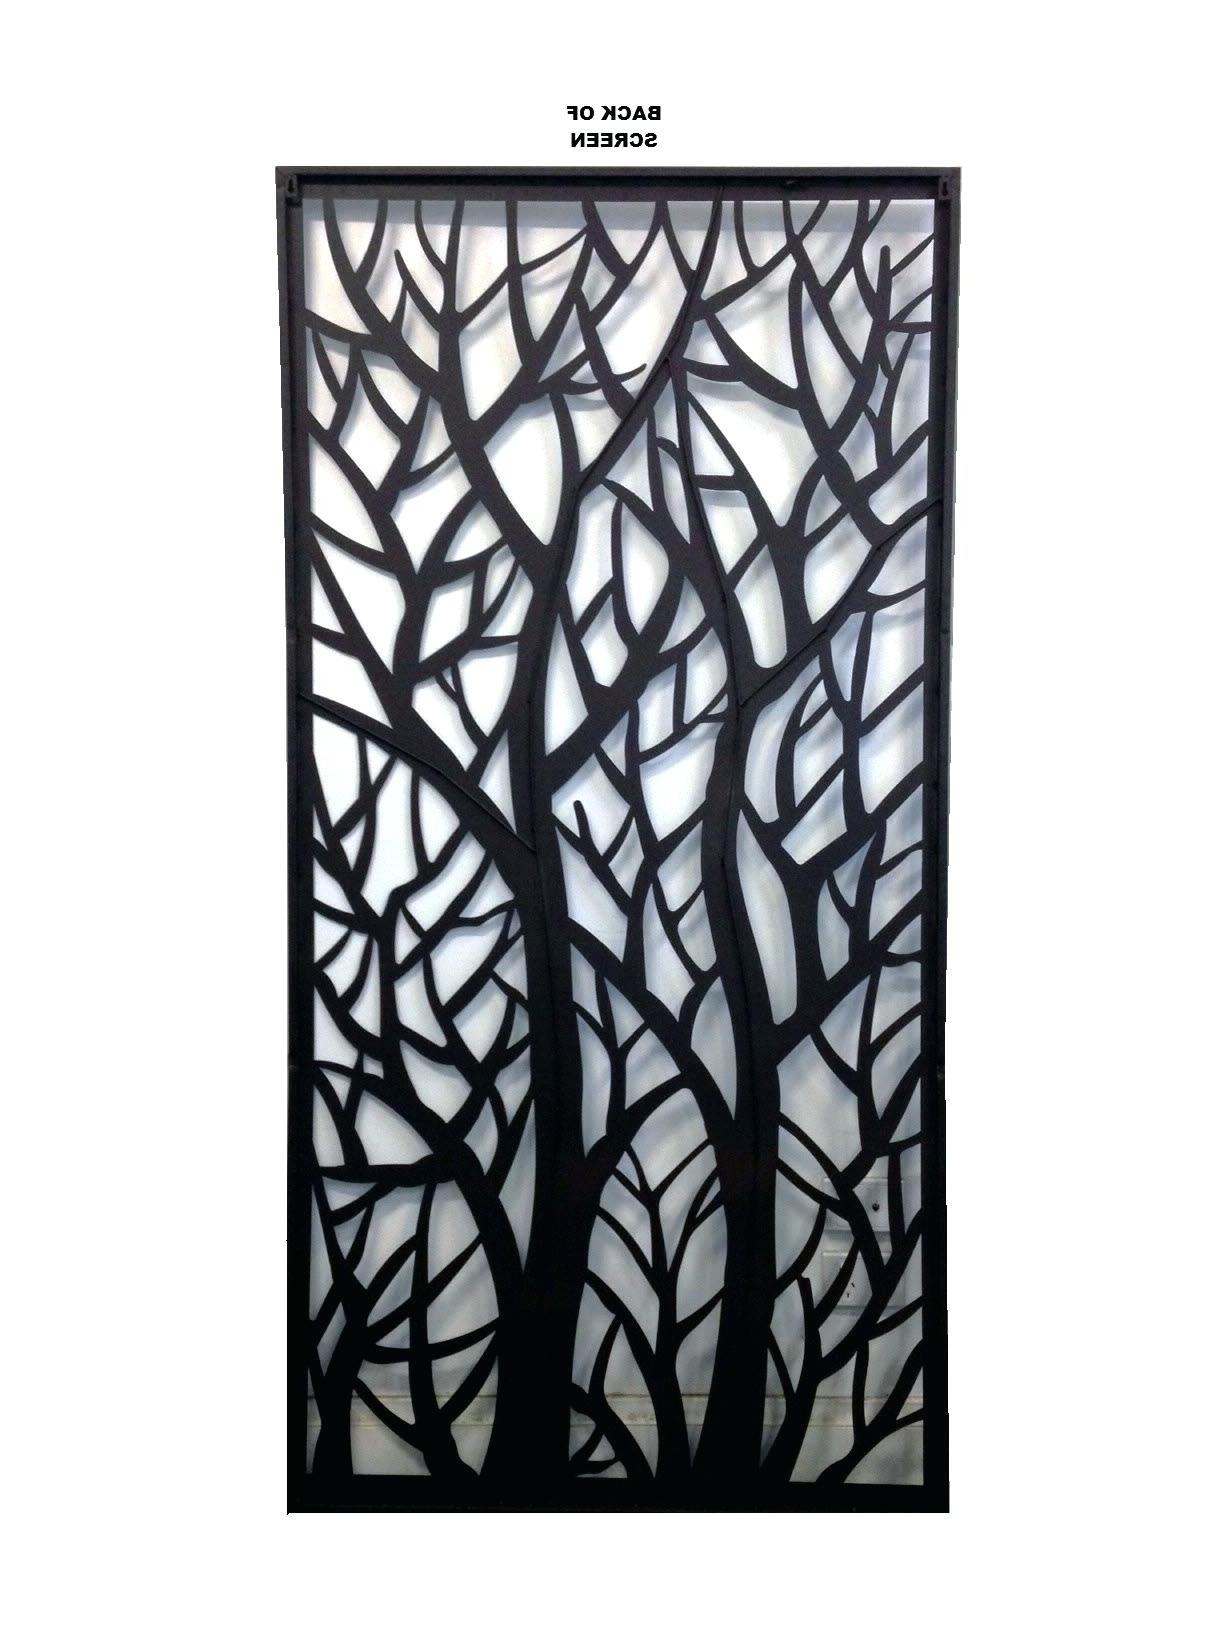 Decorative Metal Screens Wall Art Garden Ebaydecorative Bunnings With Regard To Well Liked Decorative Outdoor Metal Wall Art (Gallery 7 of 15)